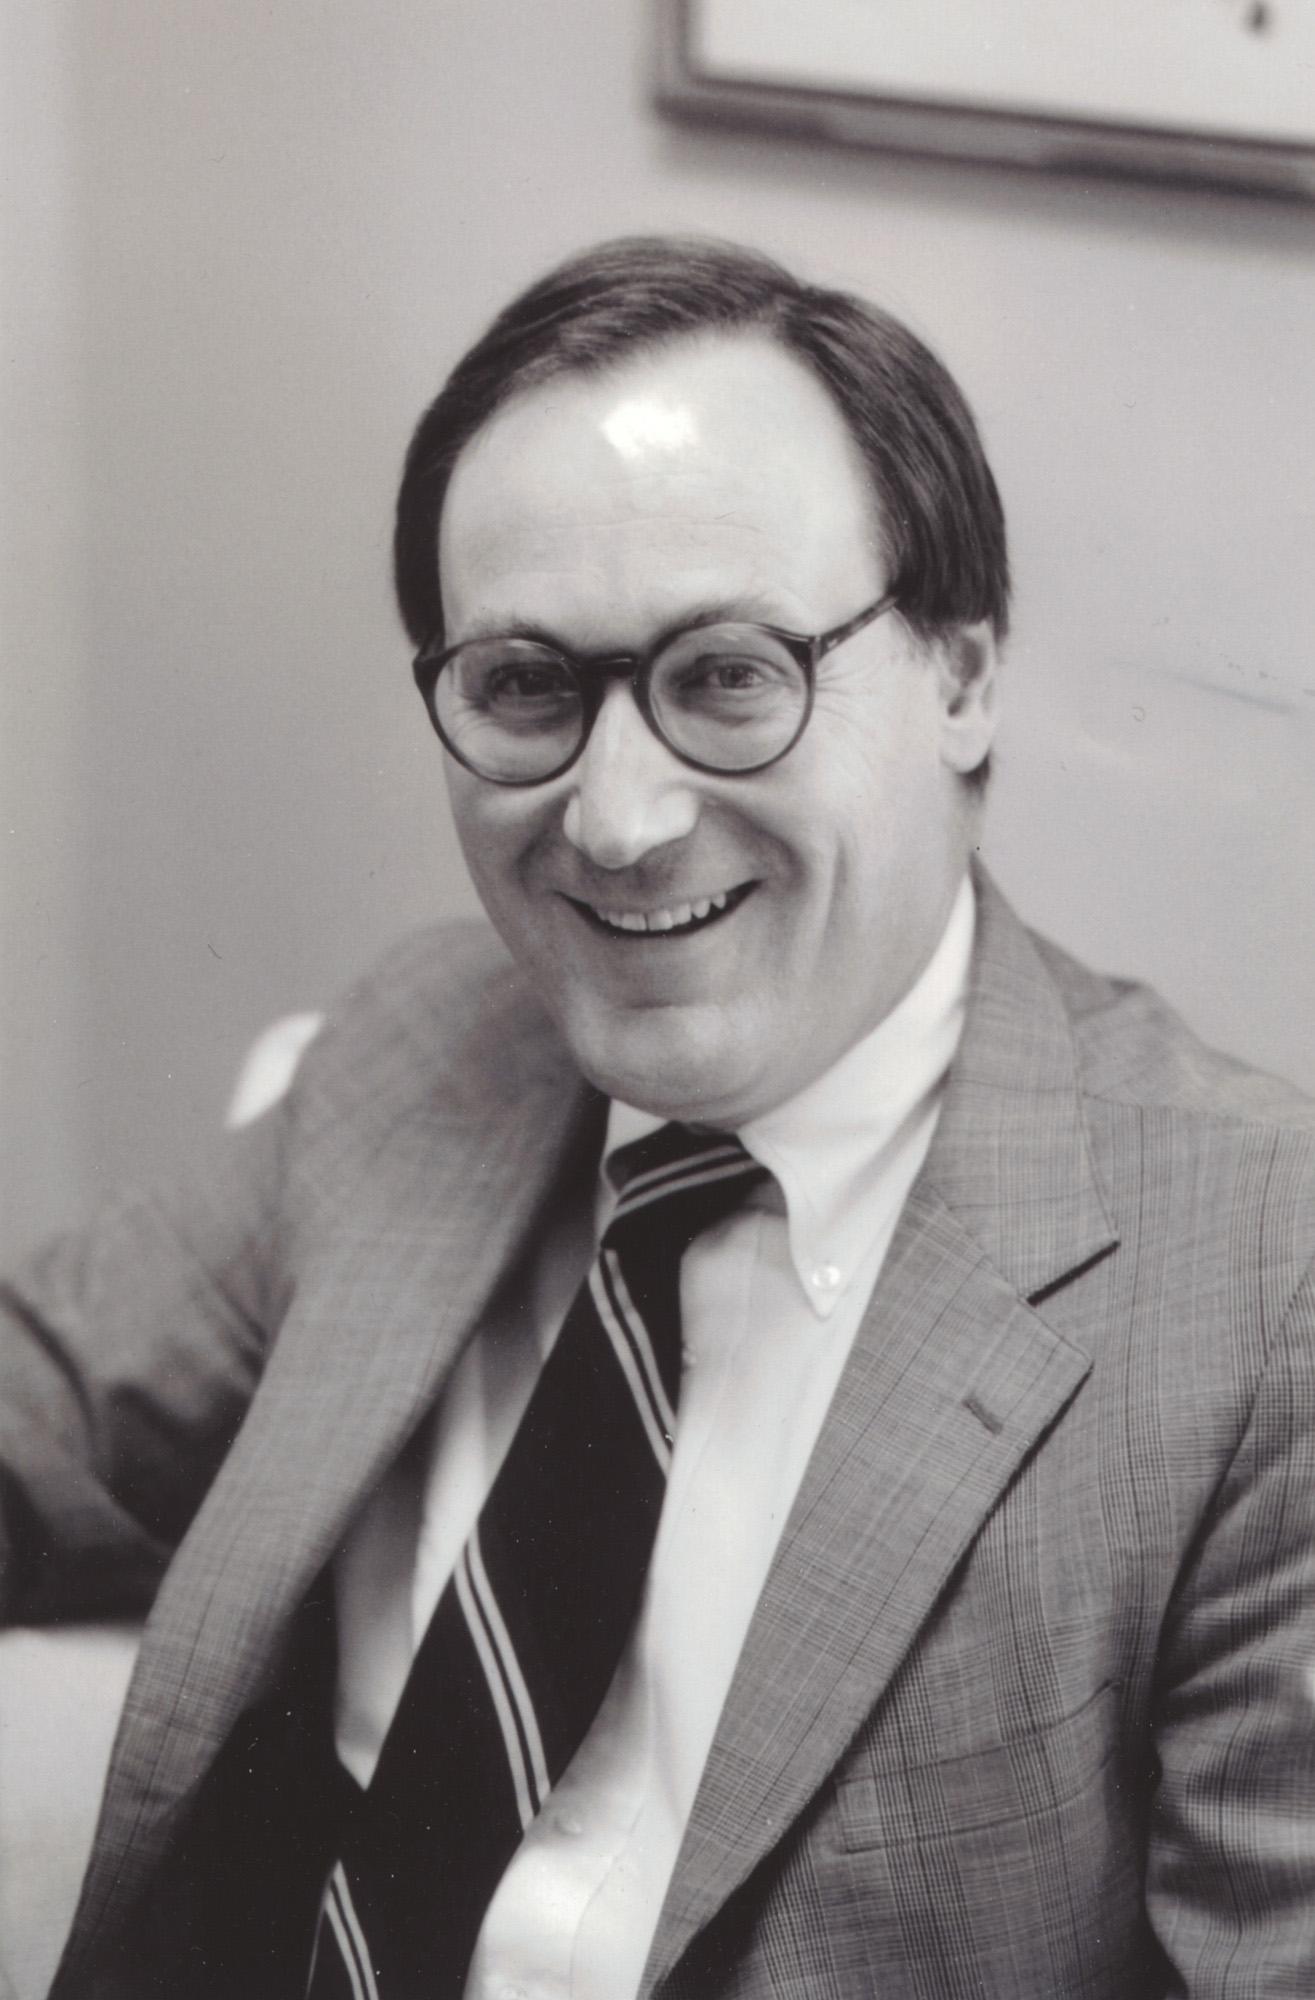 Christopher Dahl